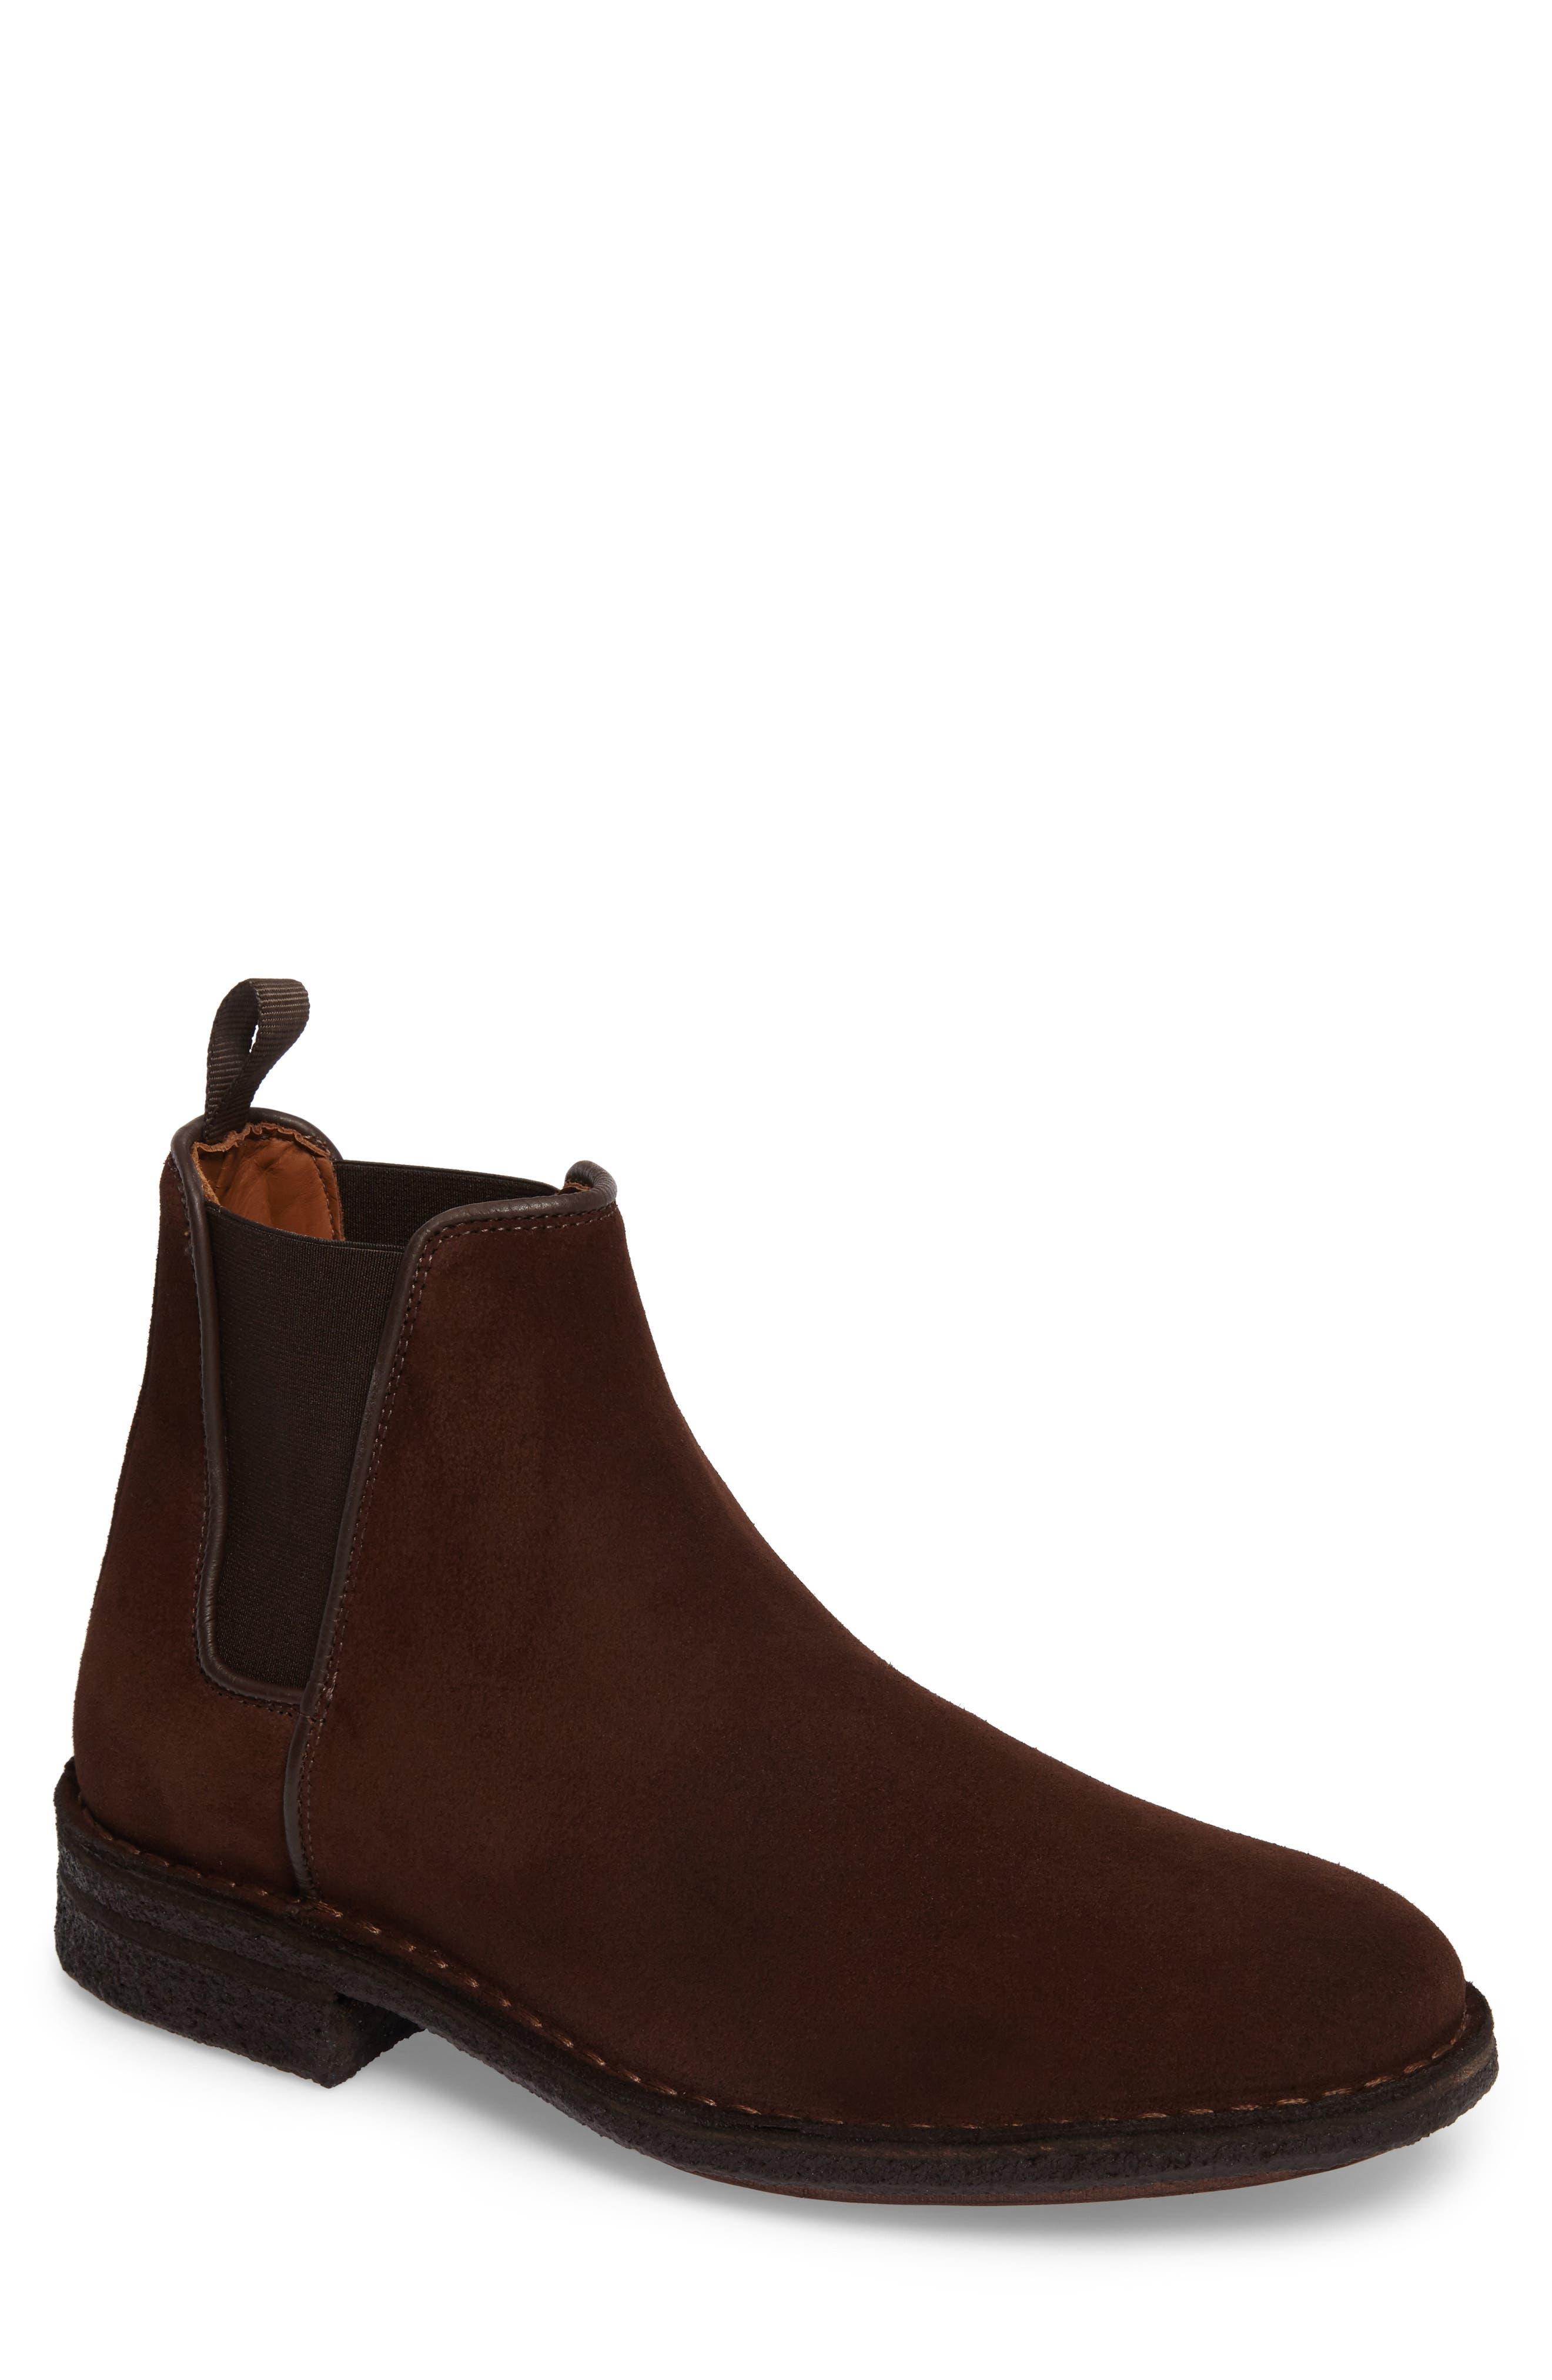 Oscar Chelsea Boot,                         Main,                         color, Medium Brown